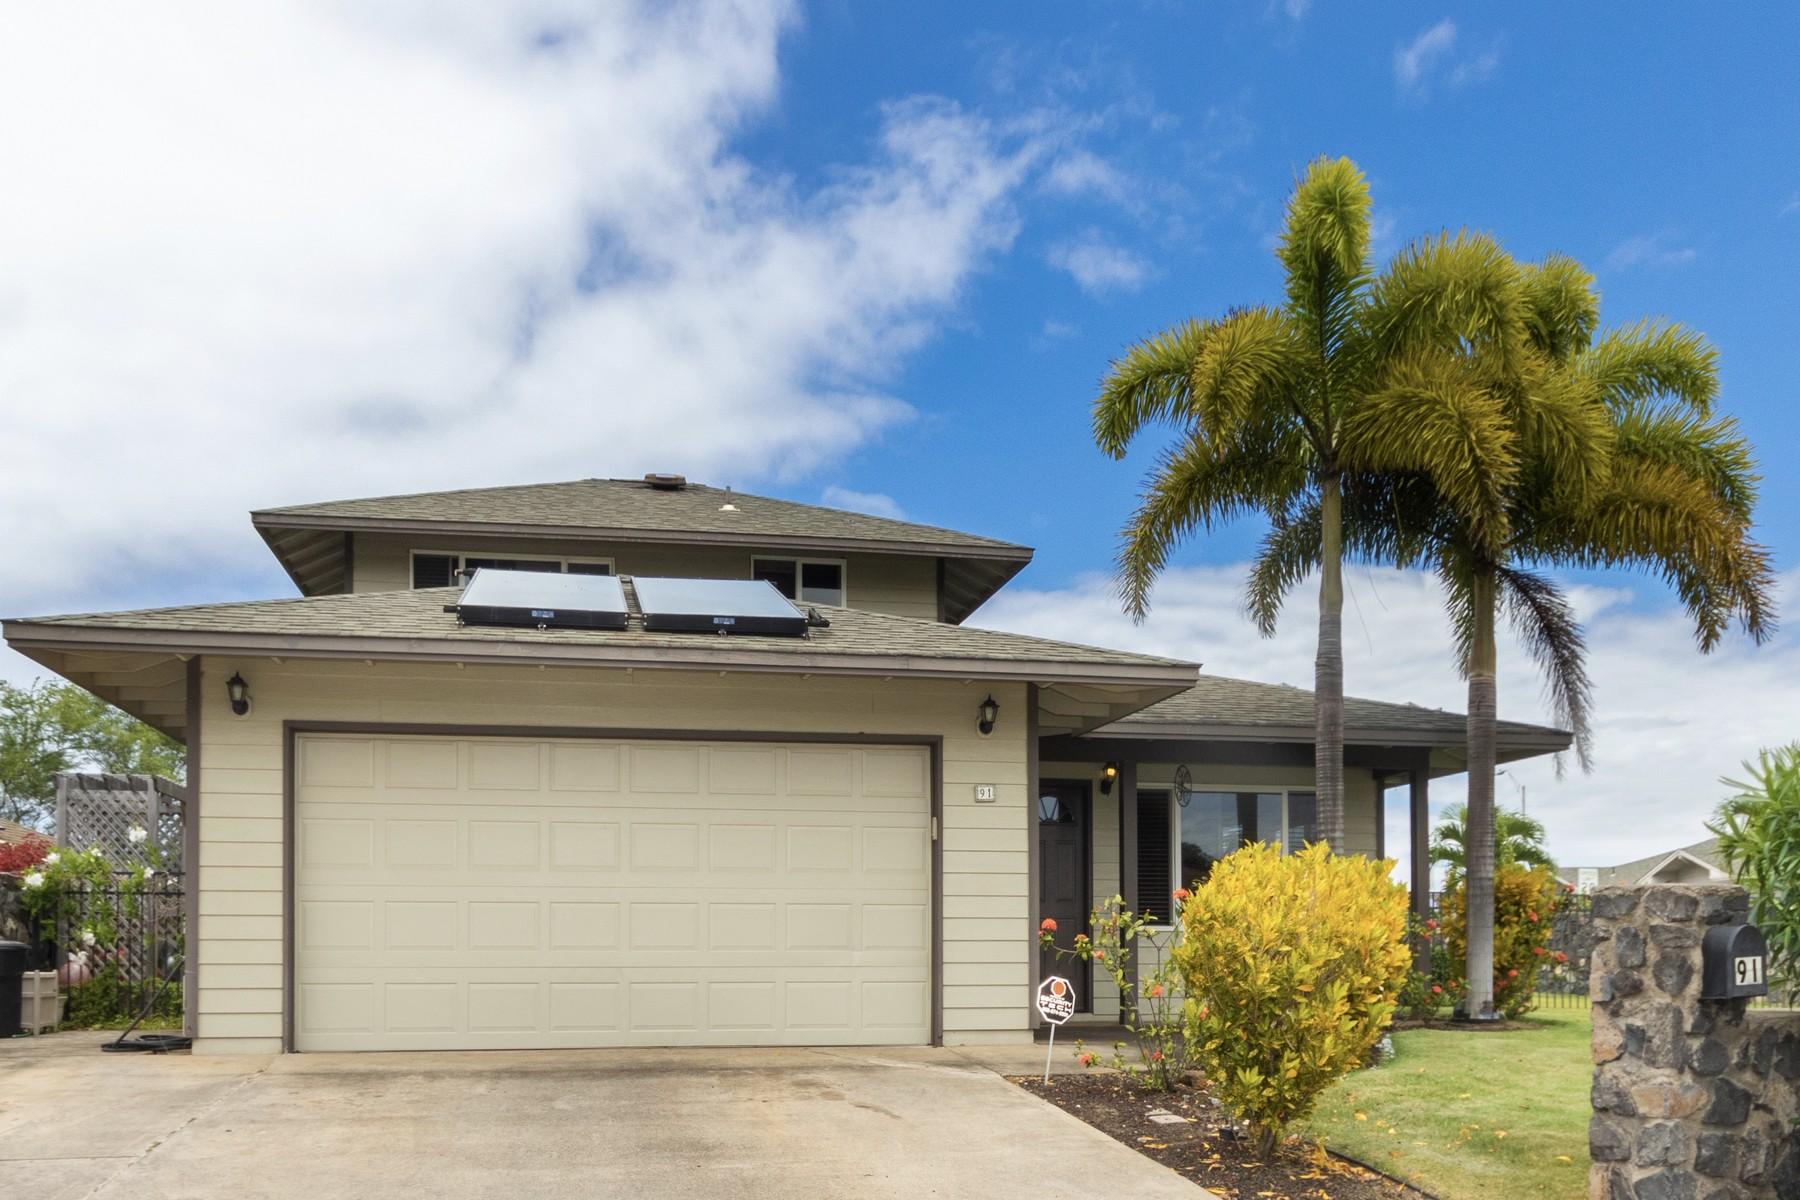 Single Family Home for Active at The Greens at Maui Lani 91 Kuukama Street Kahului, Hawaii 96732 United States